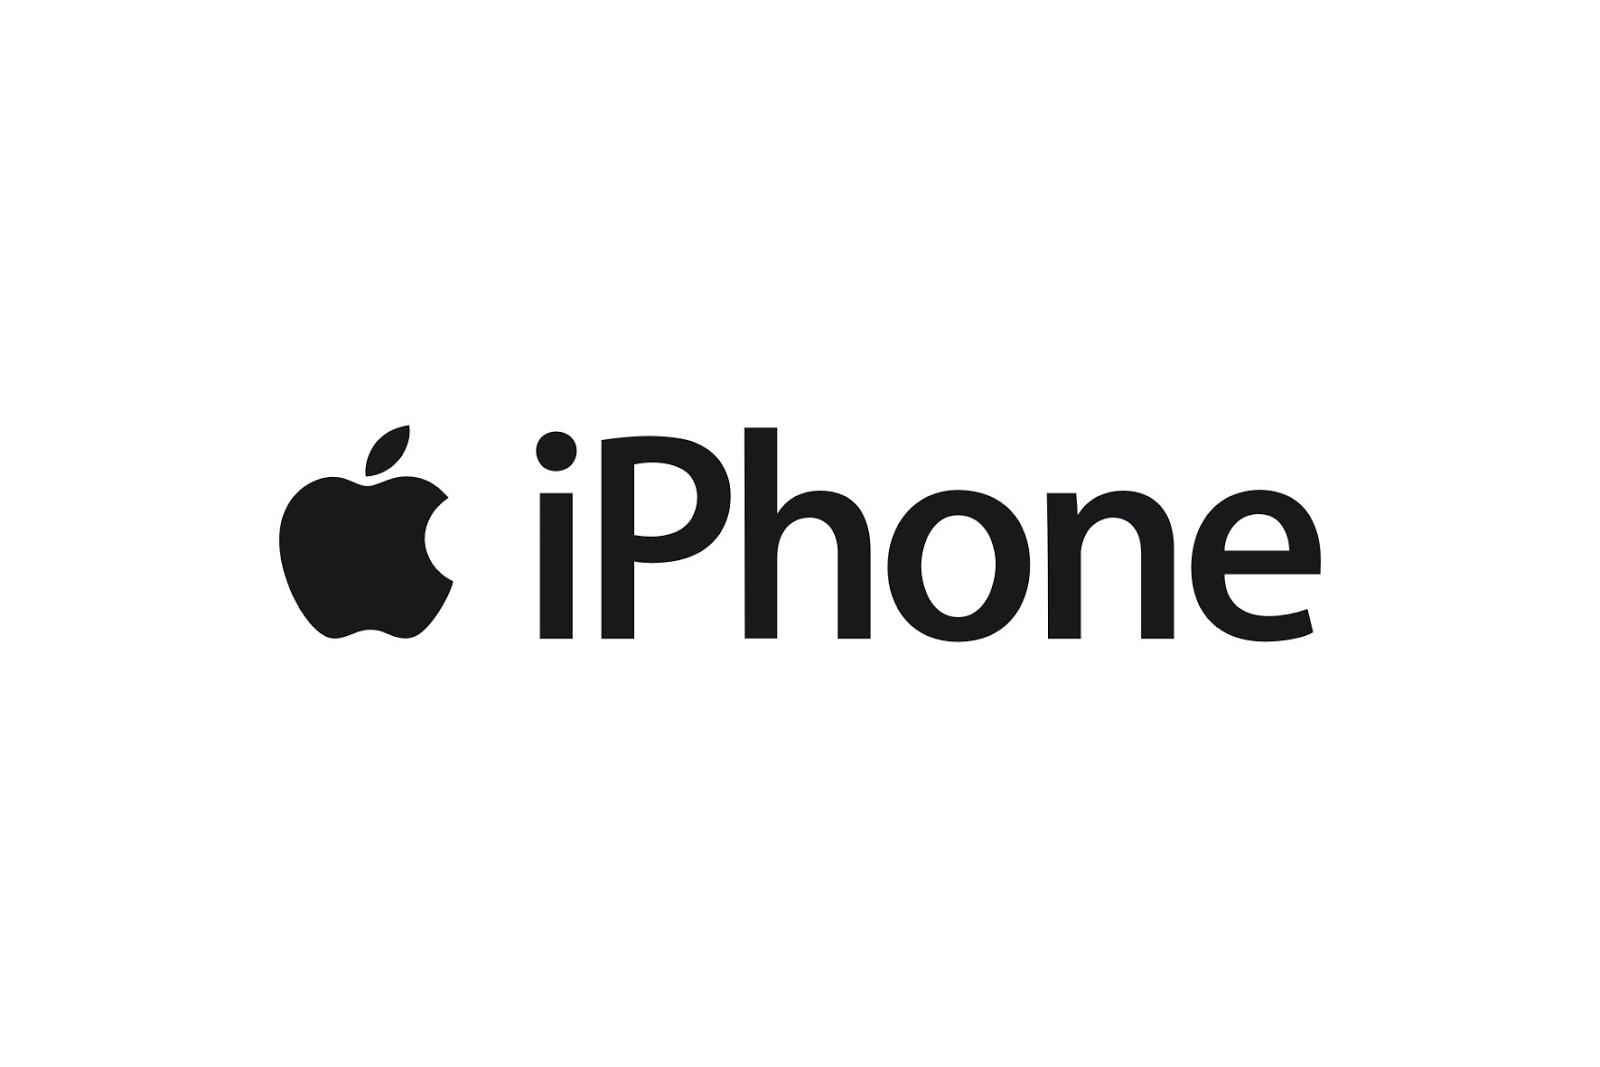 Connu Apple iPhone Logo AF33